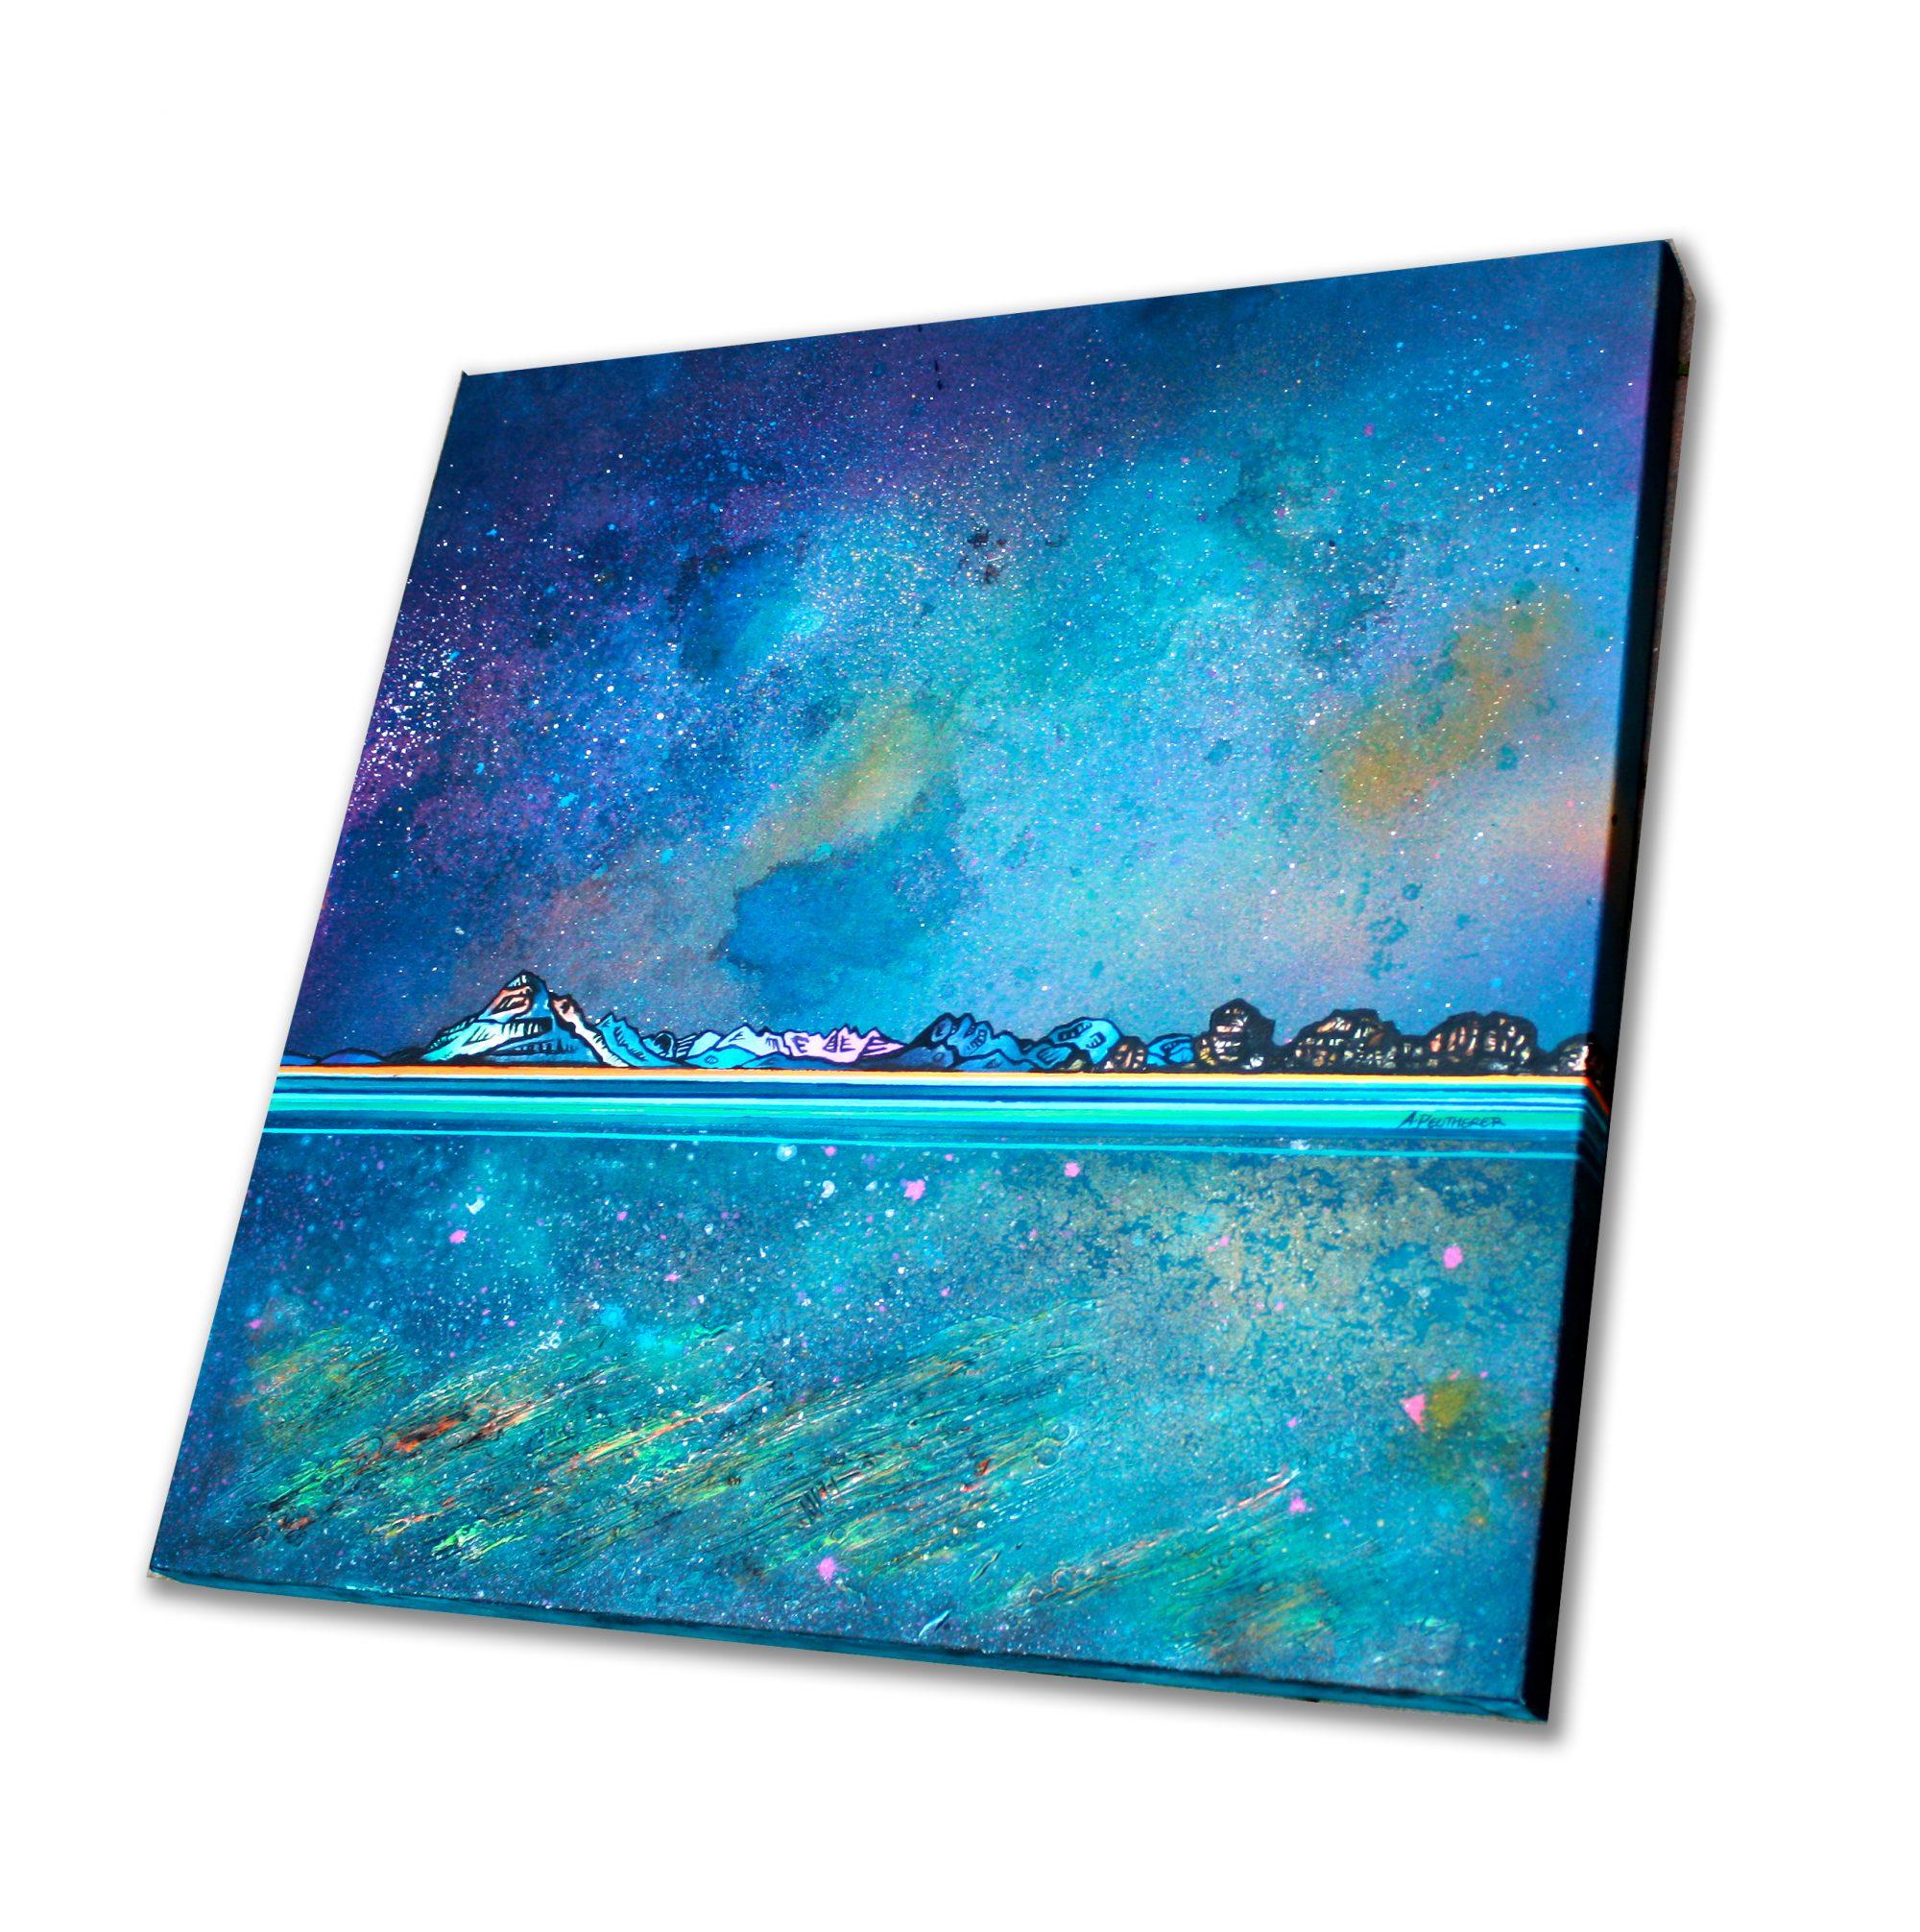 Skye , Cuillin- Original painting on canvas & art prints - Canvas detail - 3D Texture View